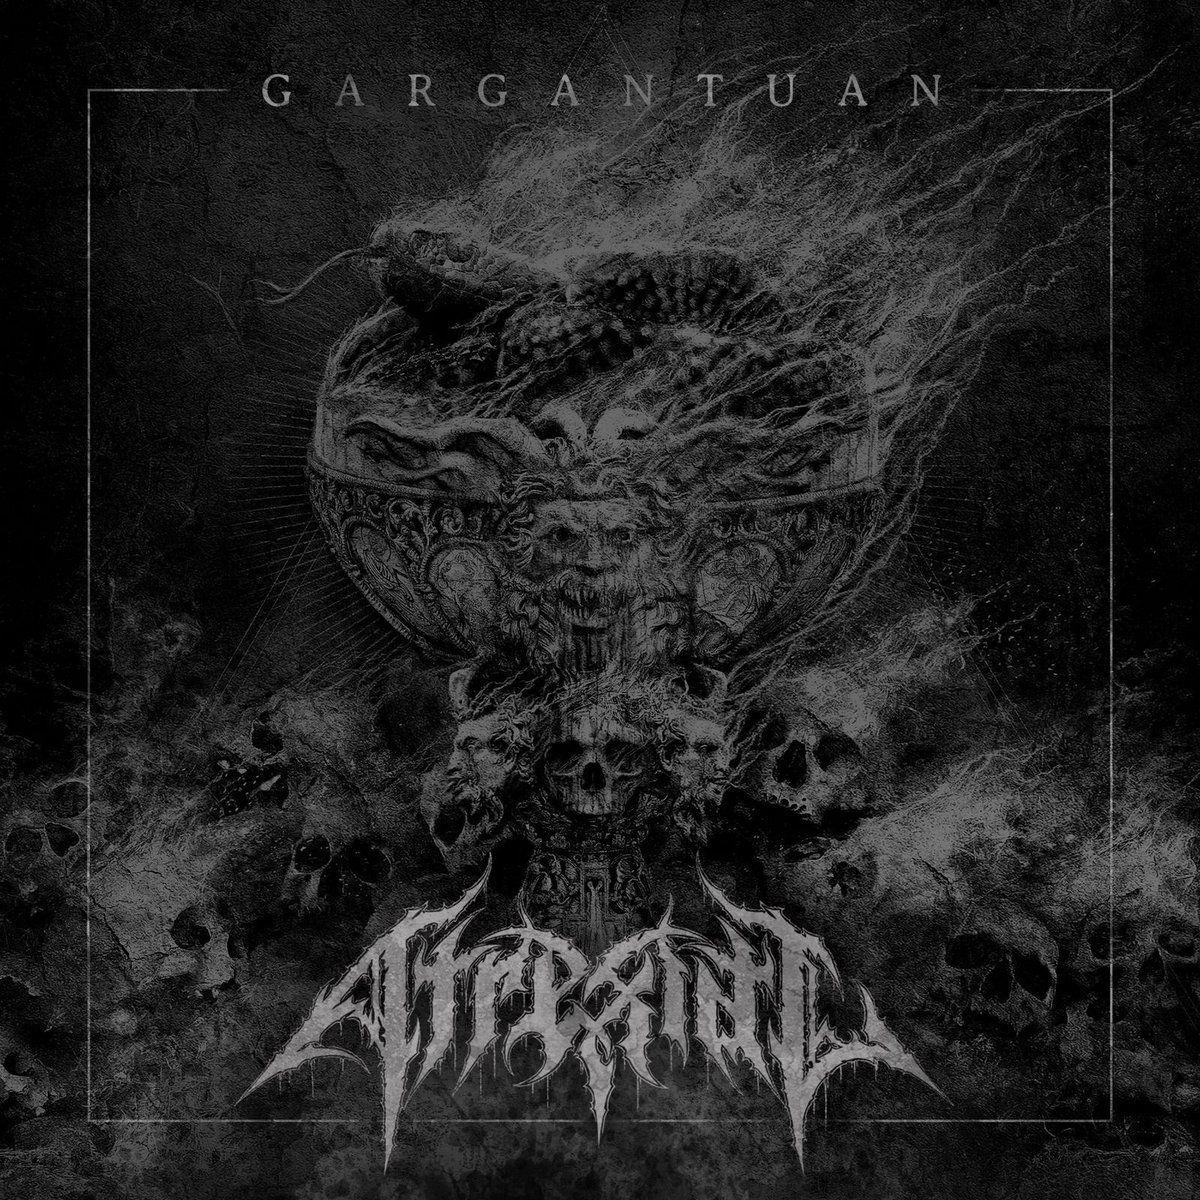 Review for Atrexial - Gargantuan